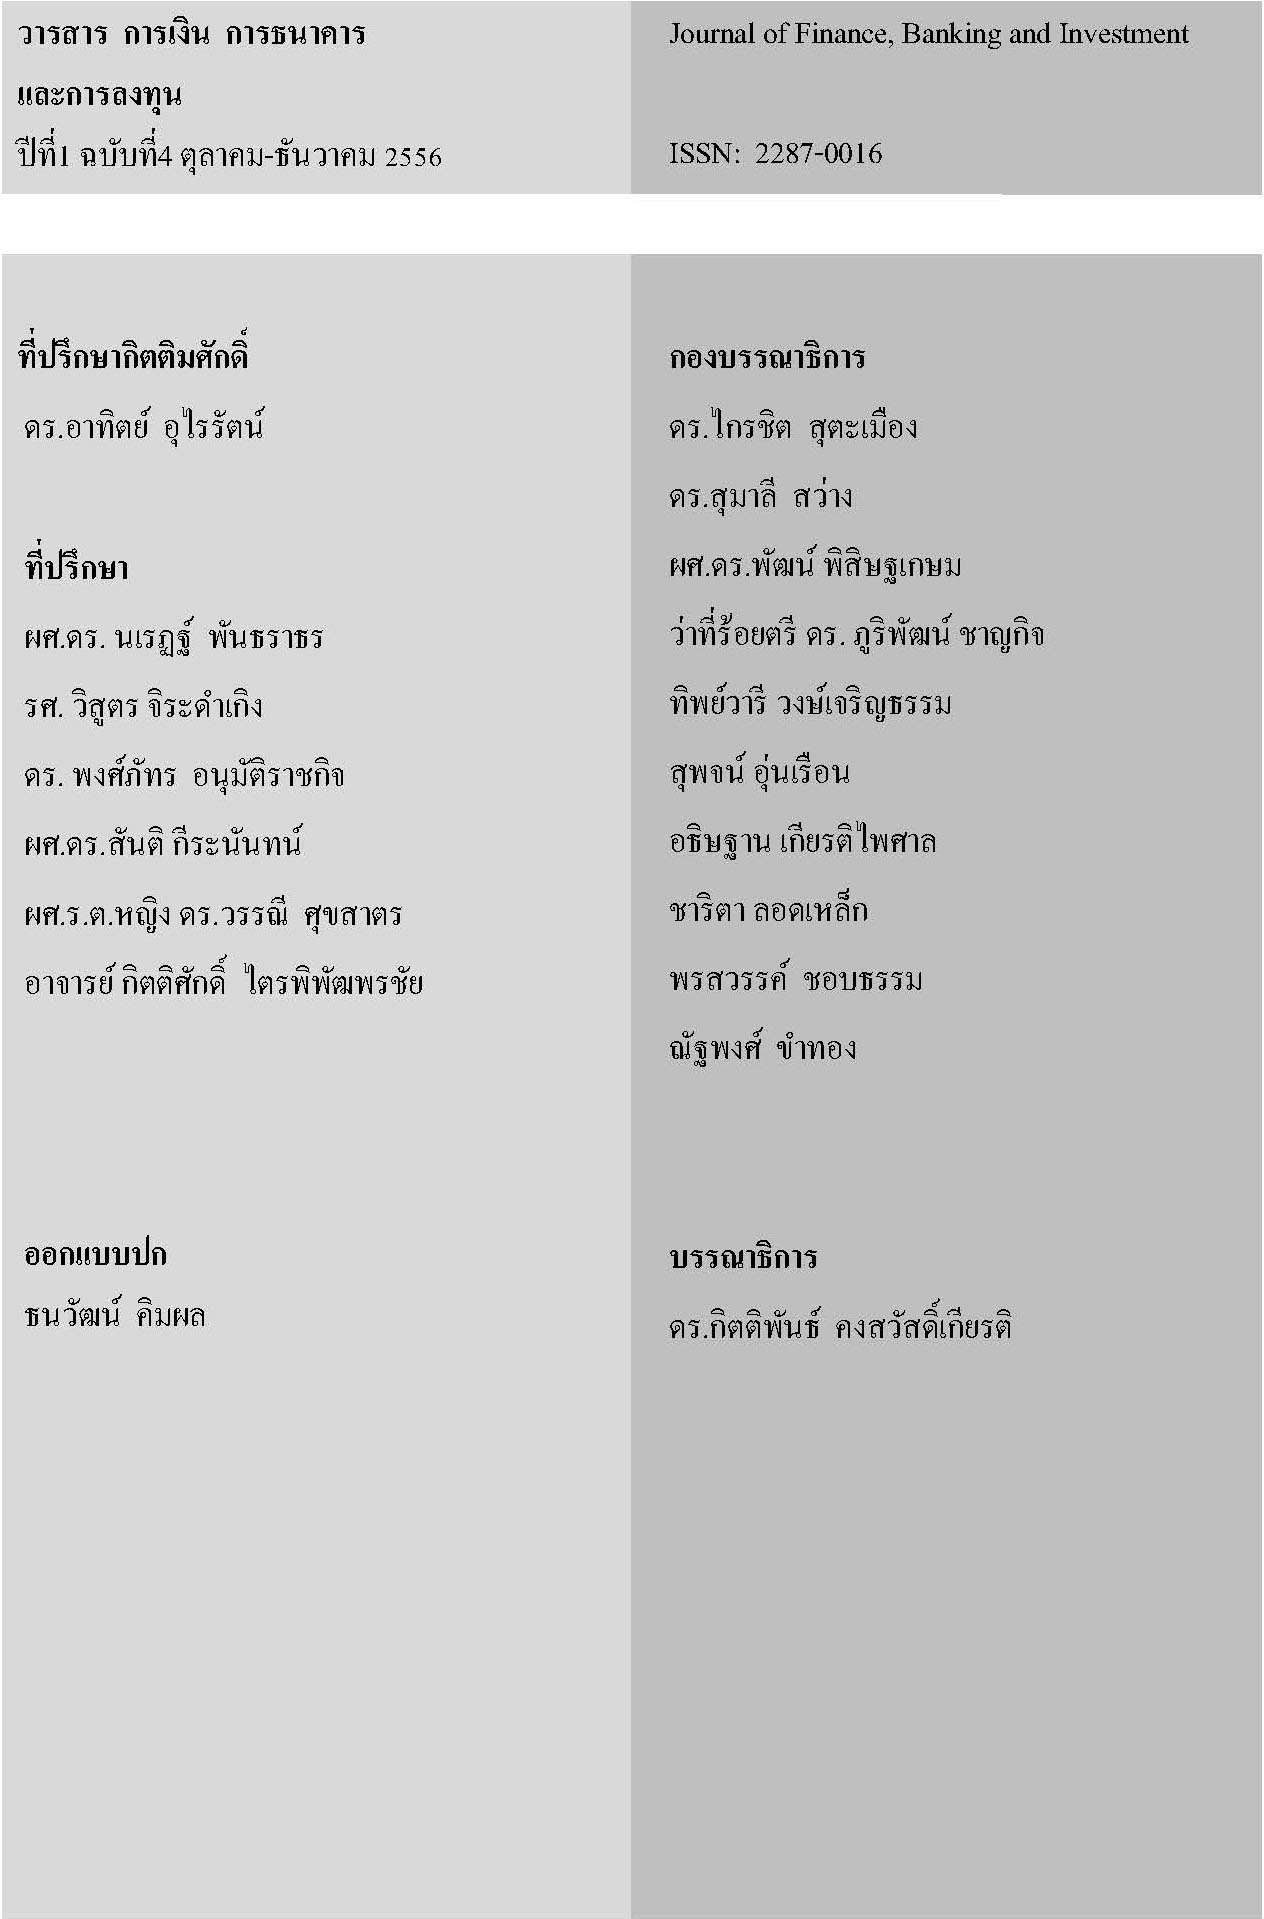 editor1_4f